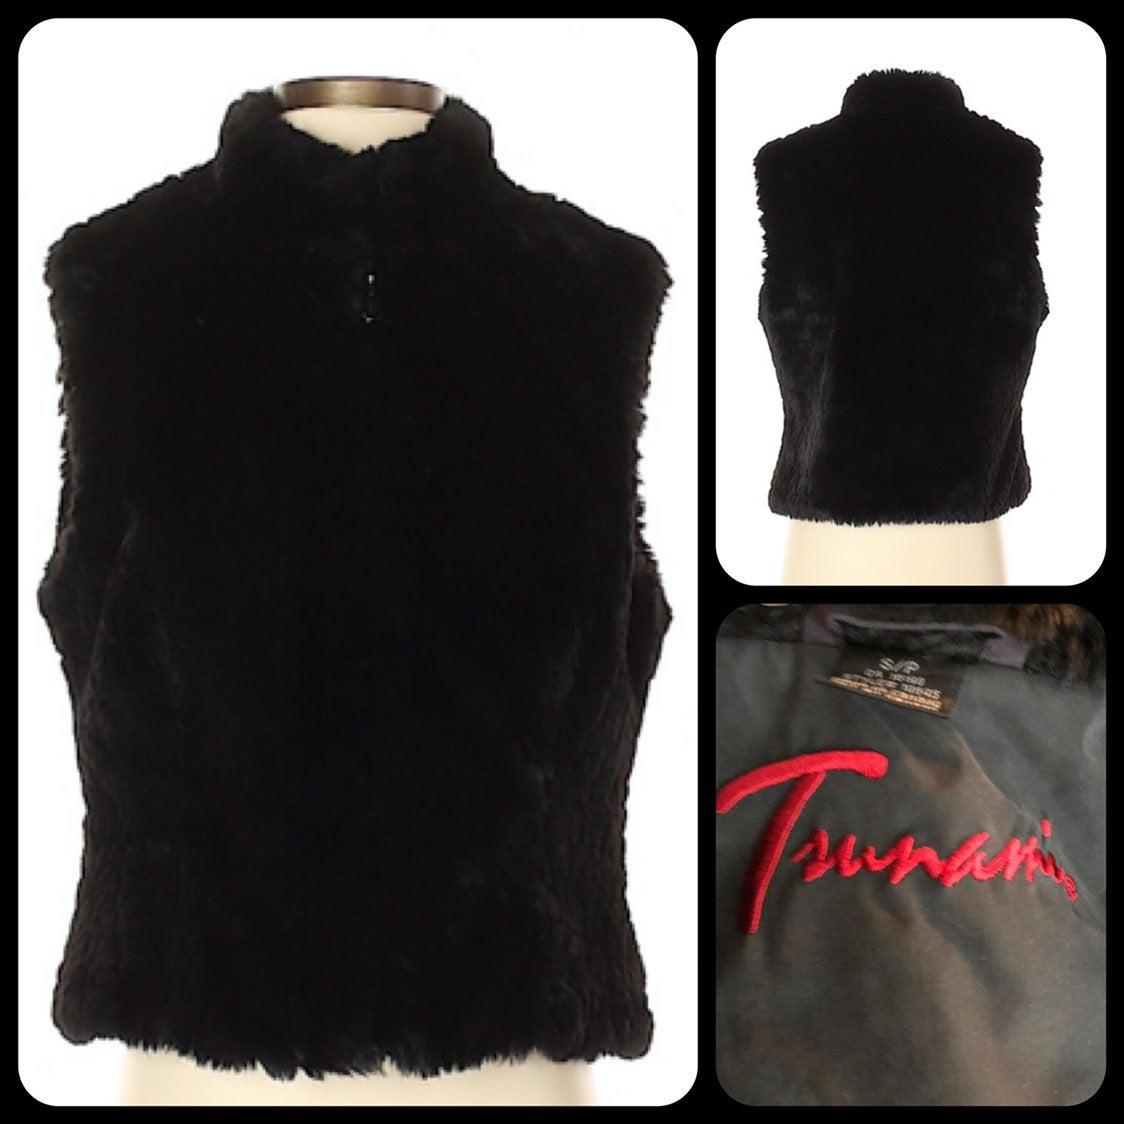 Tsunami Black Faux Fur Vest Jacket S